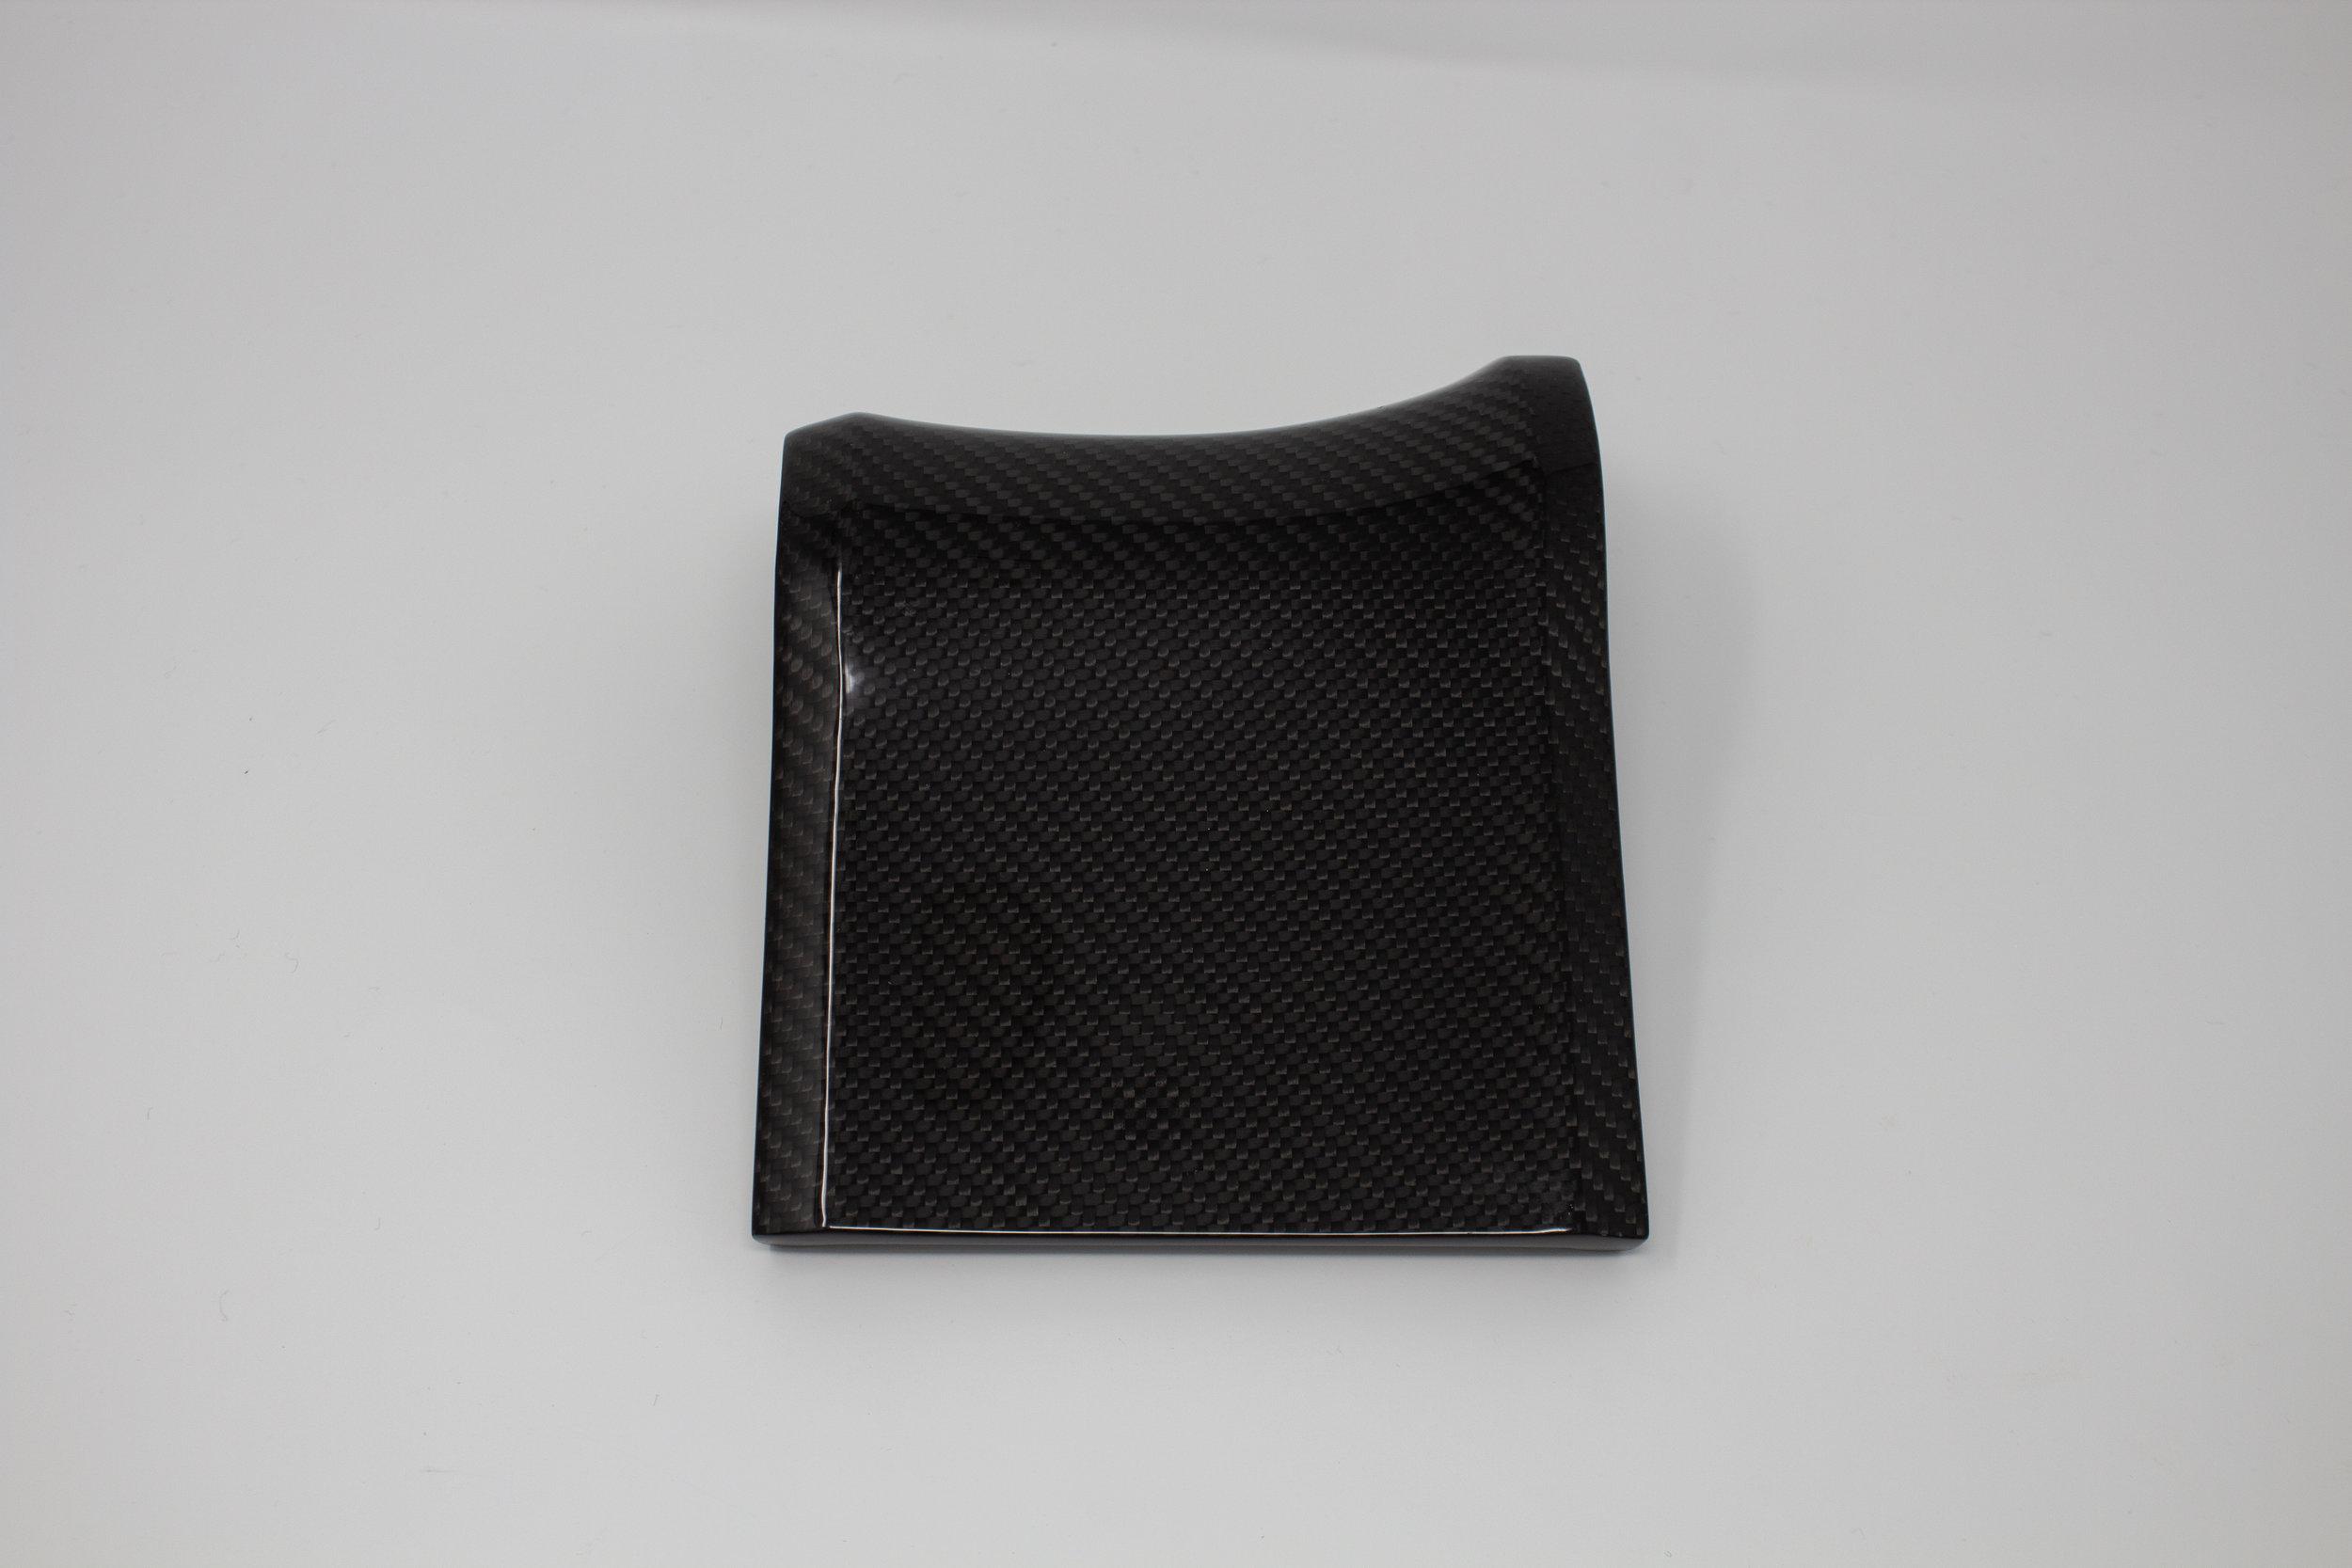 ford-carbon-fiber-door-trim-1.jpg